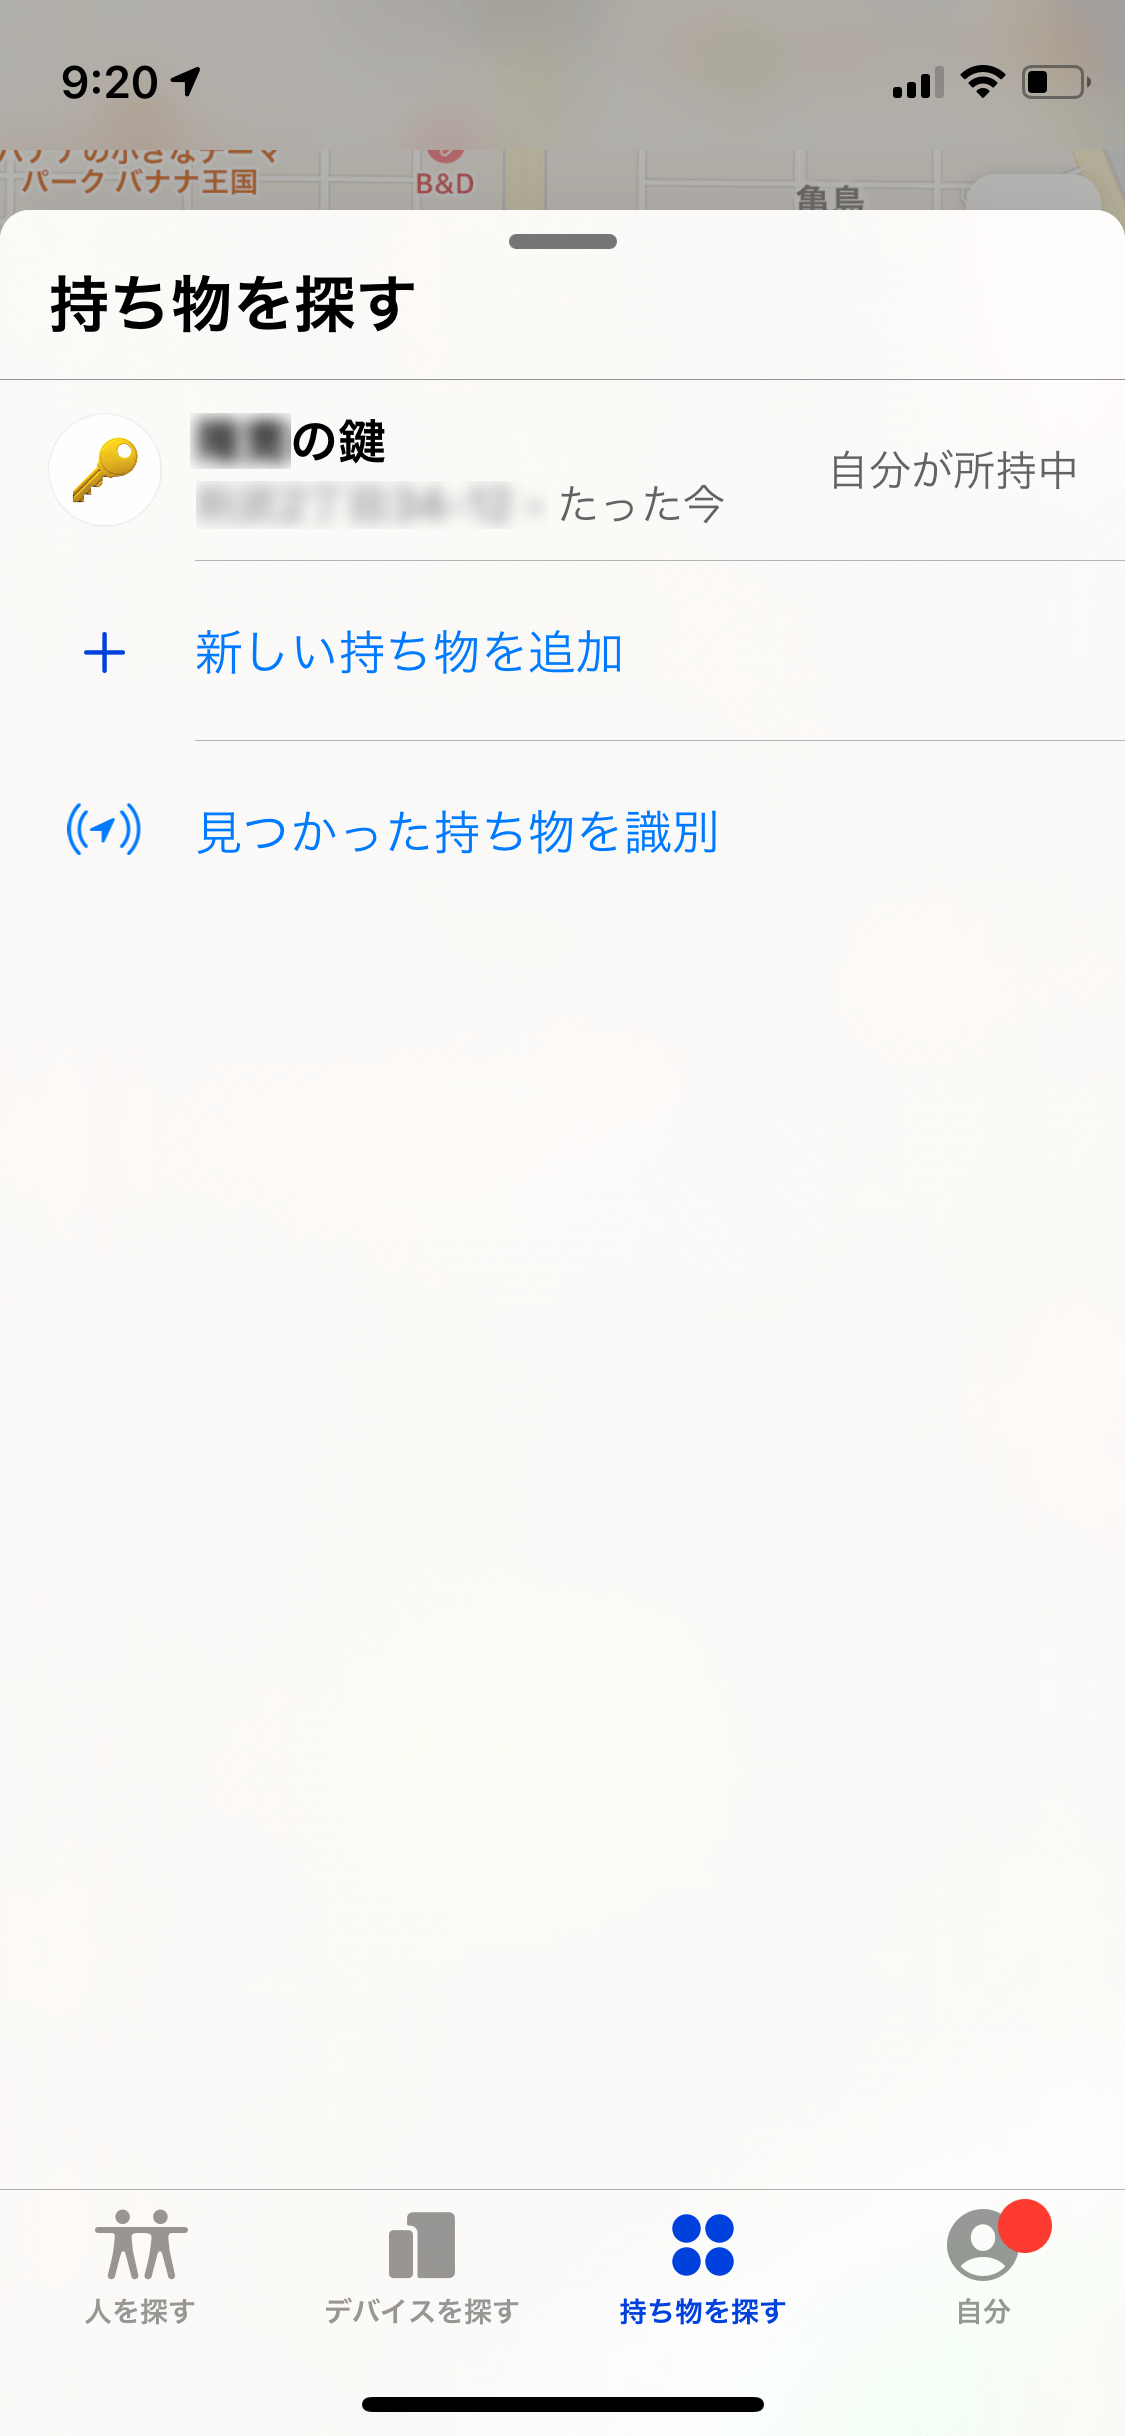 iPhoneの「探す」アプリの画面